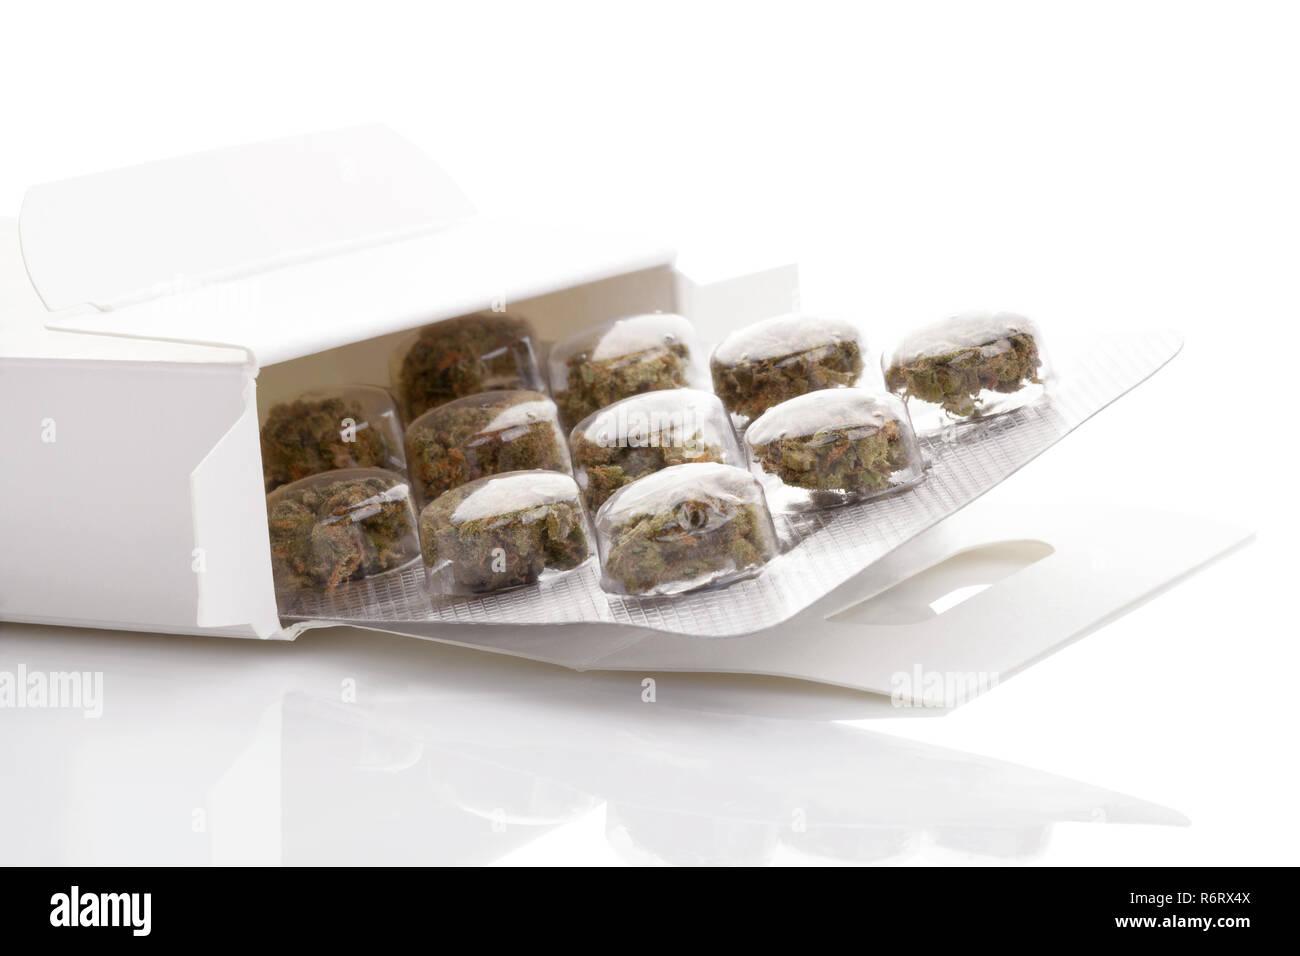 Medical Marijuana in blister pack. - Stock Image